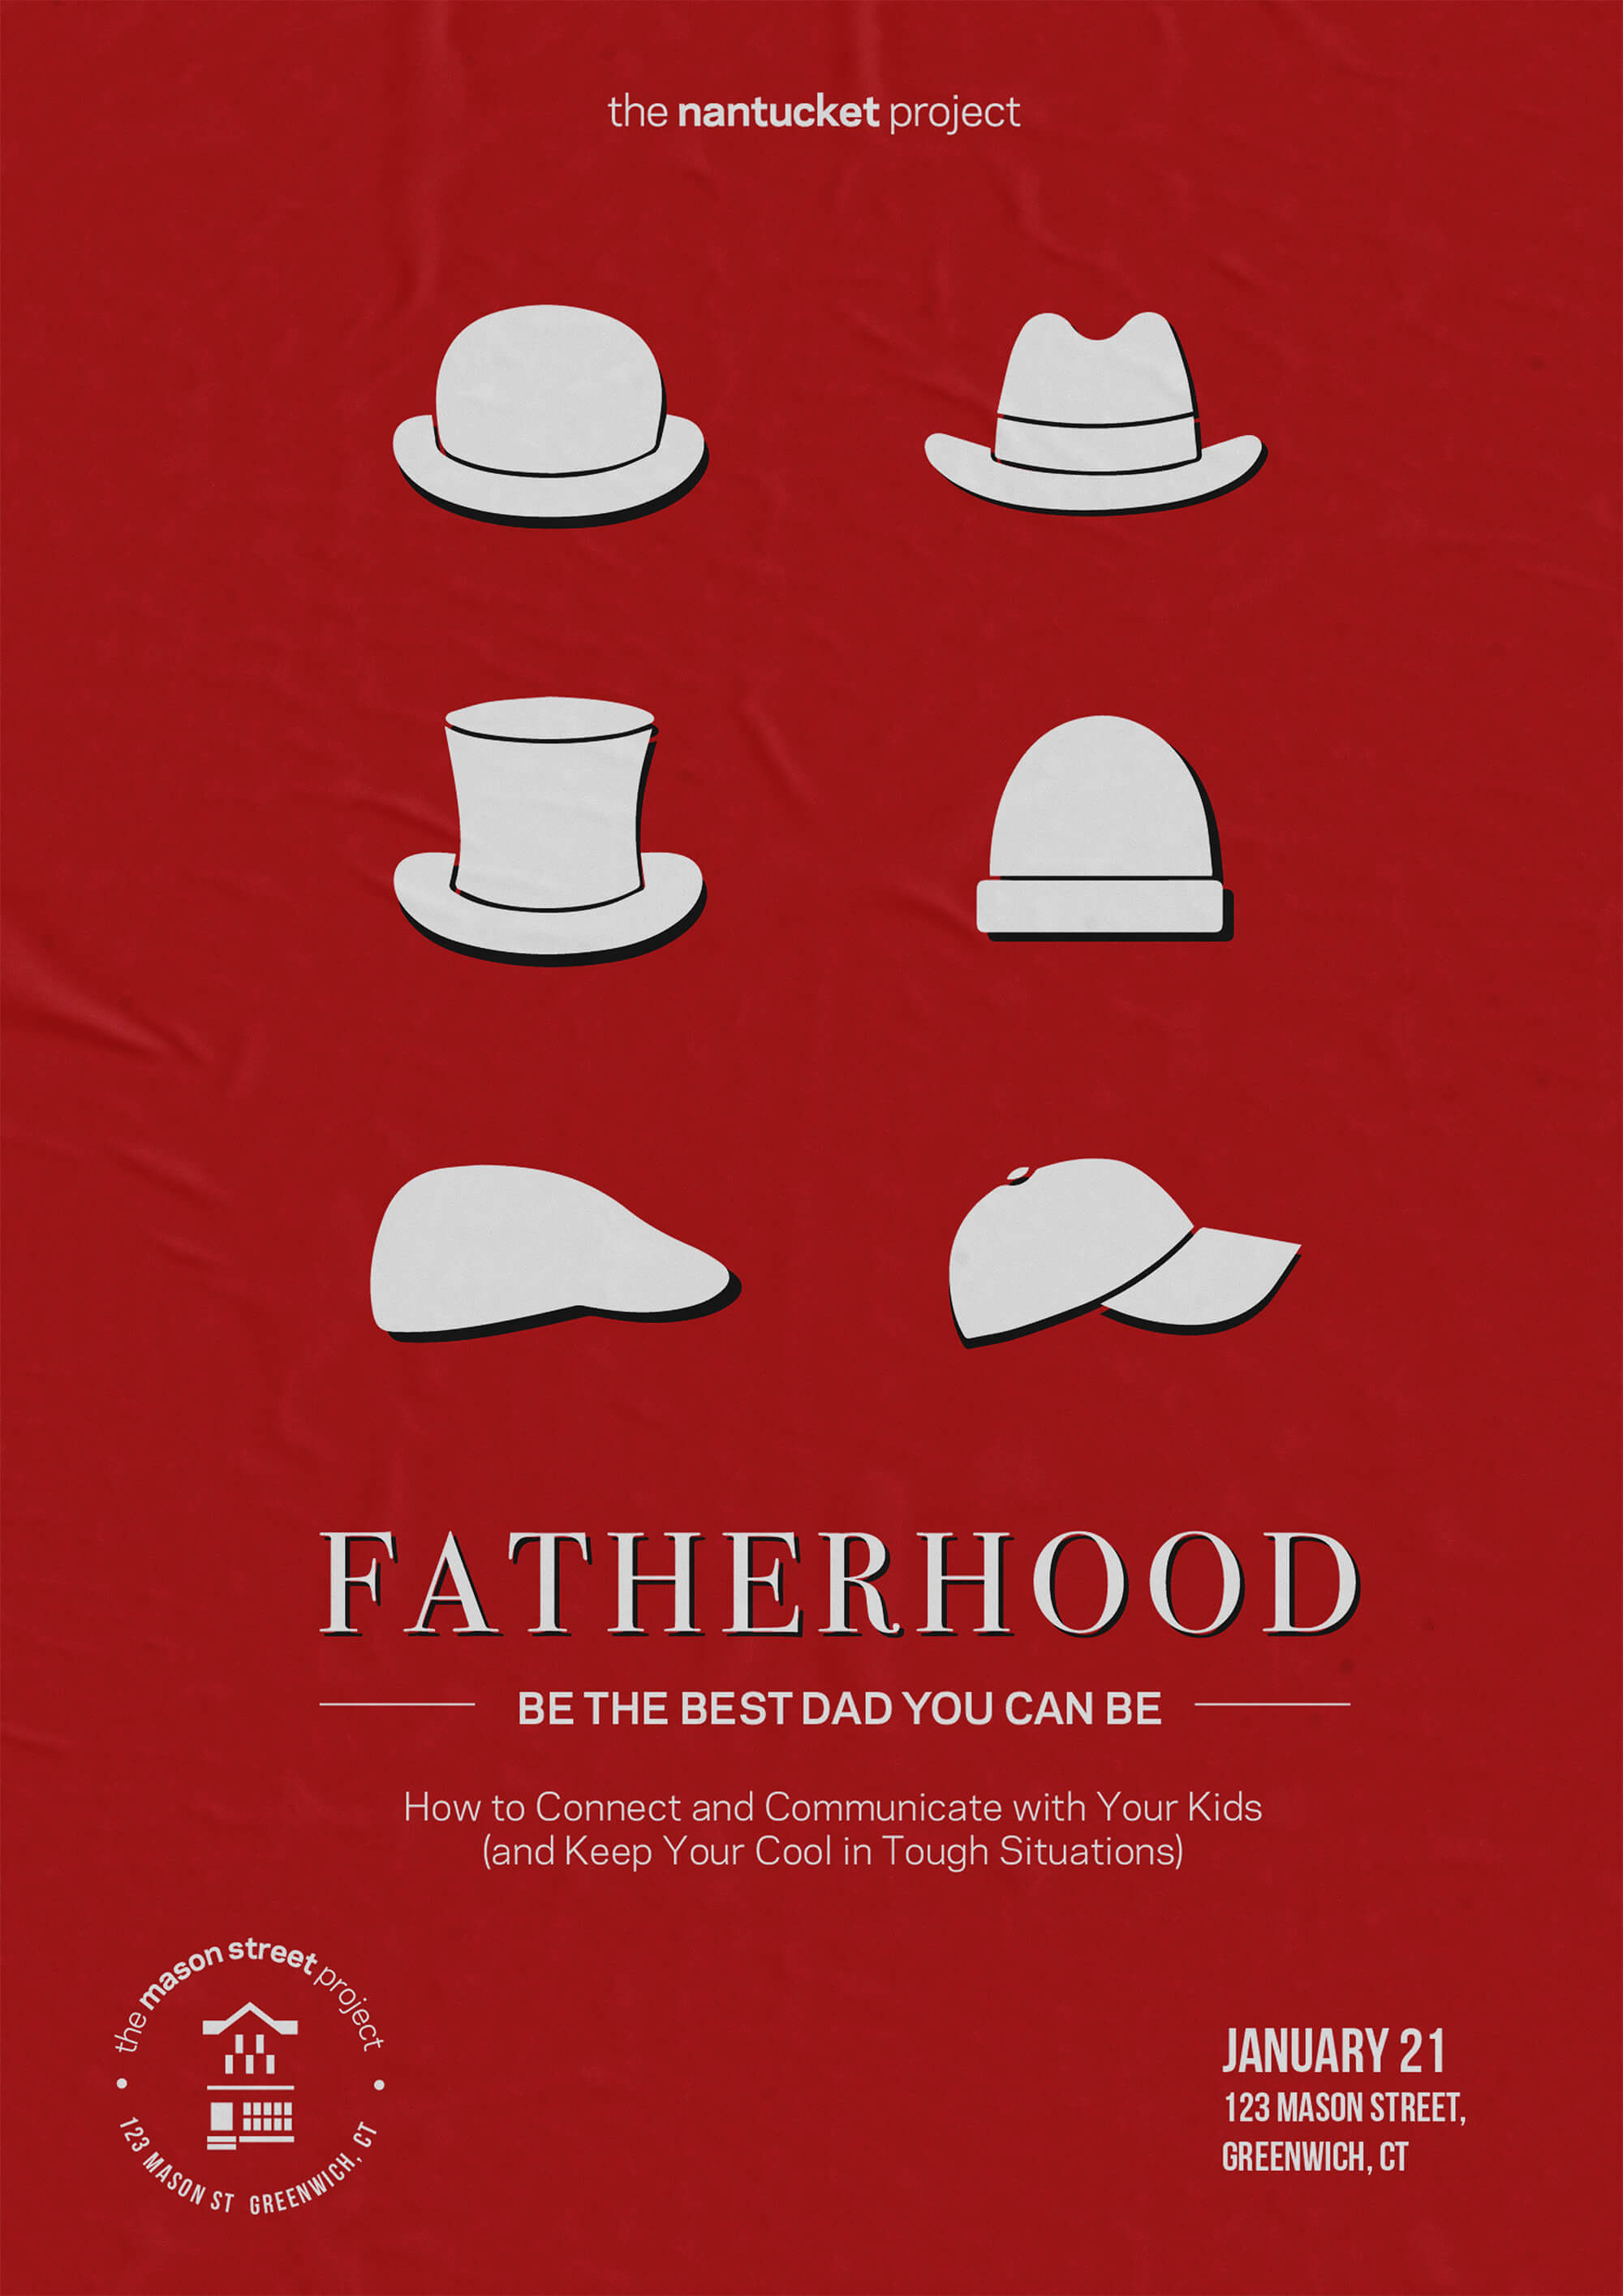 fatherhood_texture copy